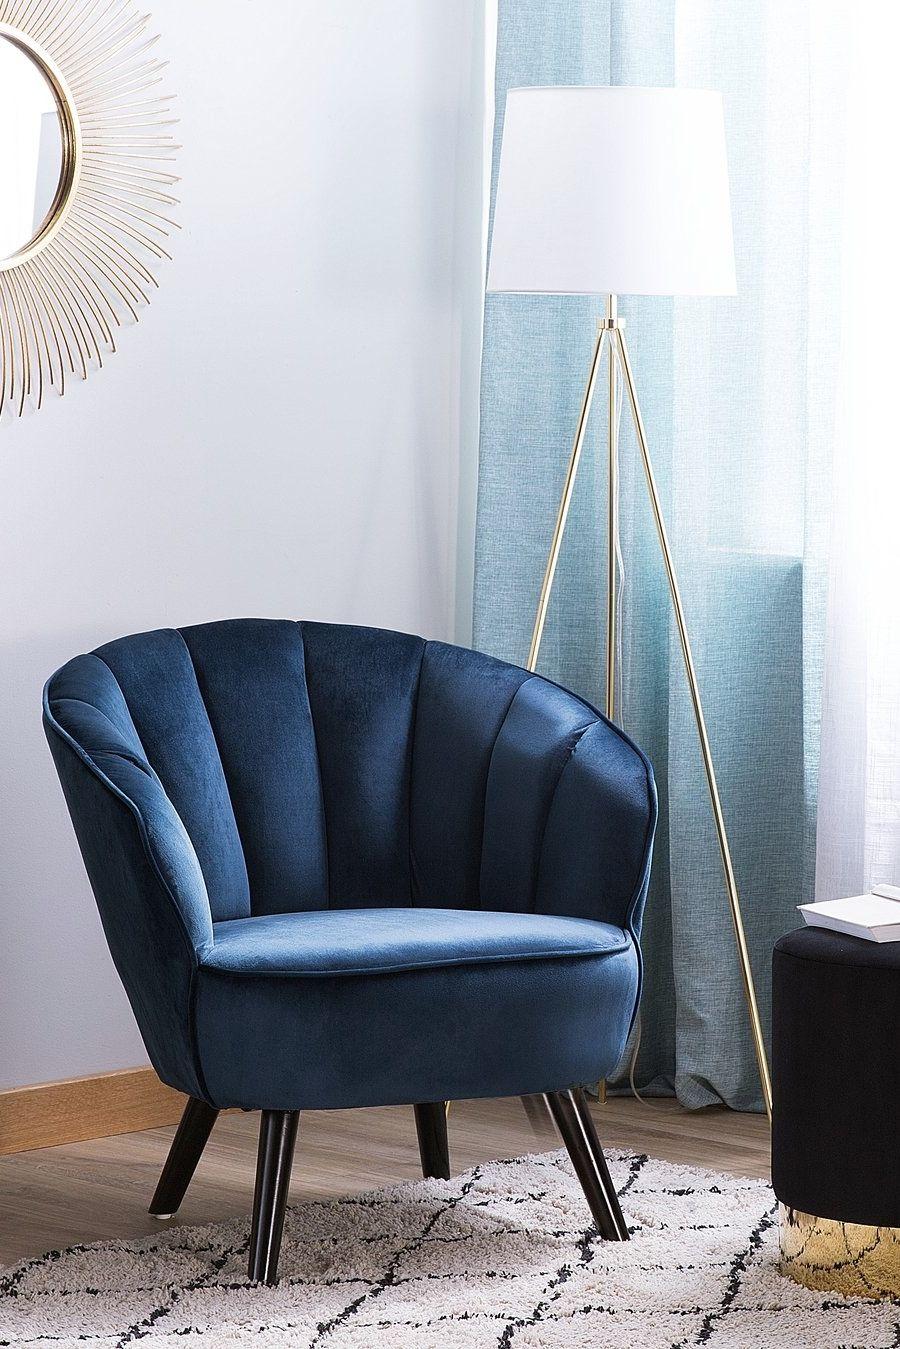 Fotel Welur Granatowy Dala Salon W 2019 Wystrój Meble I